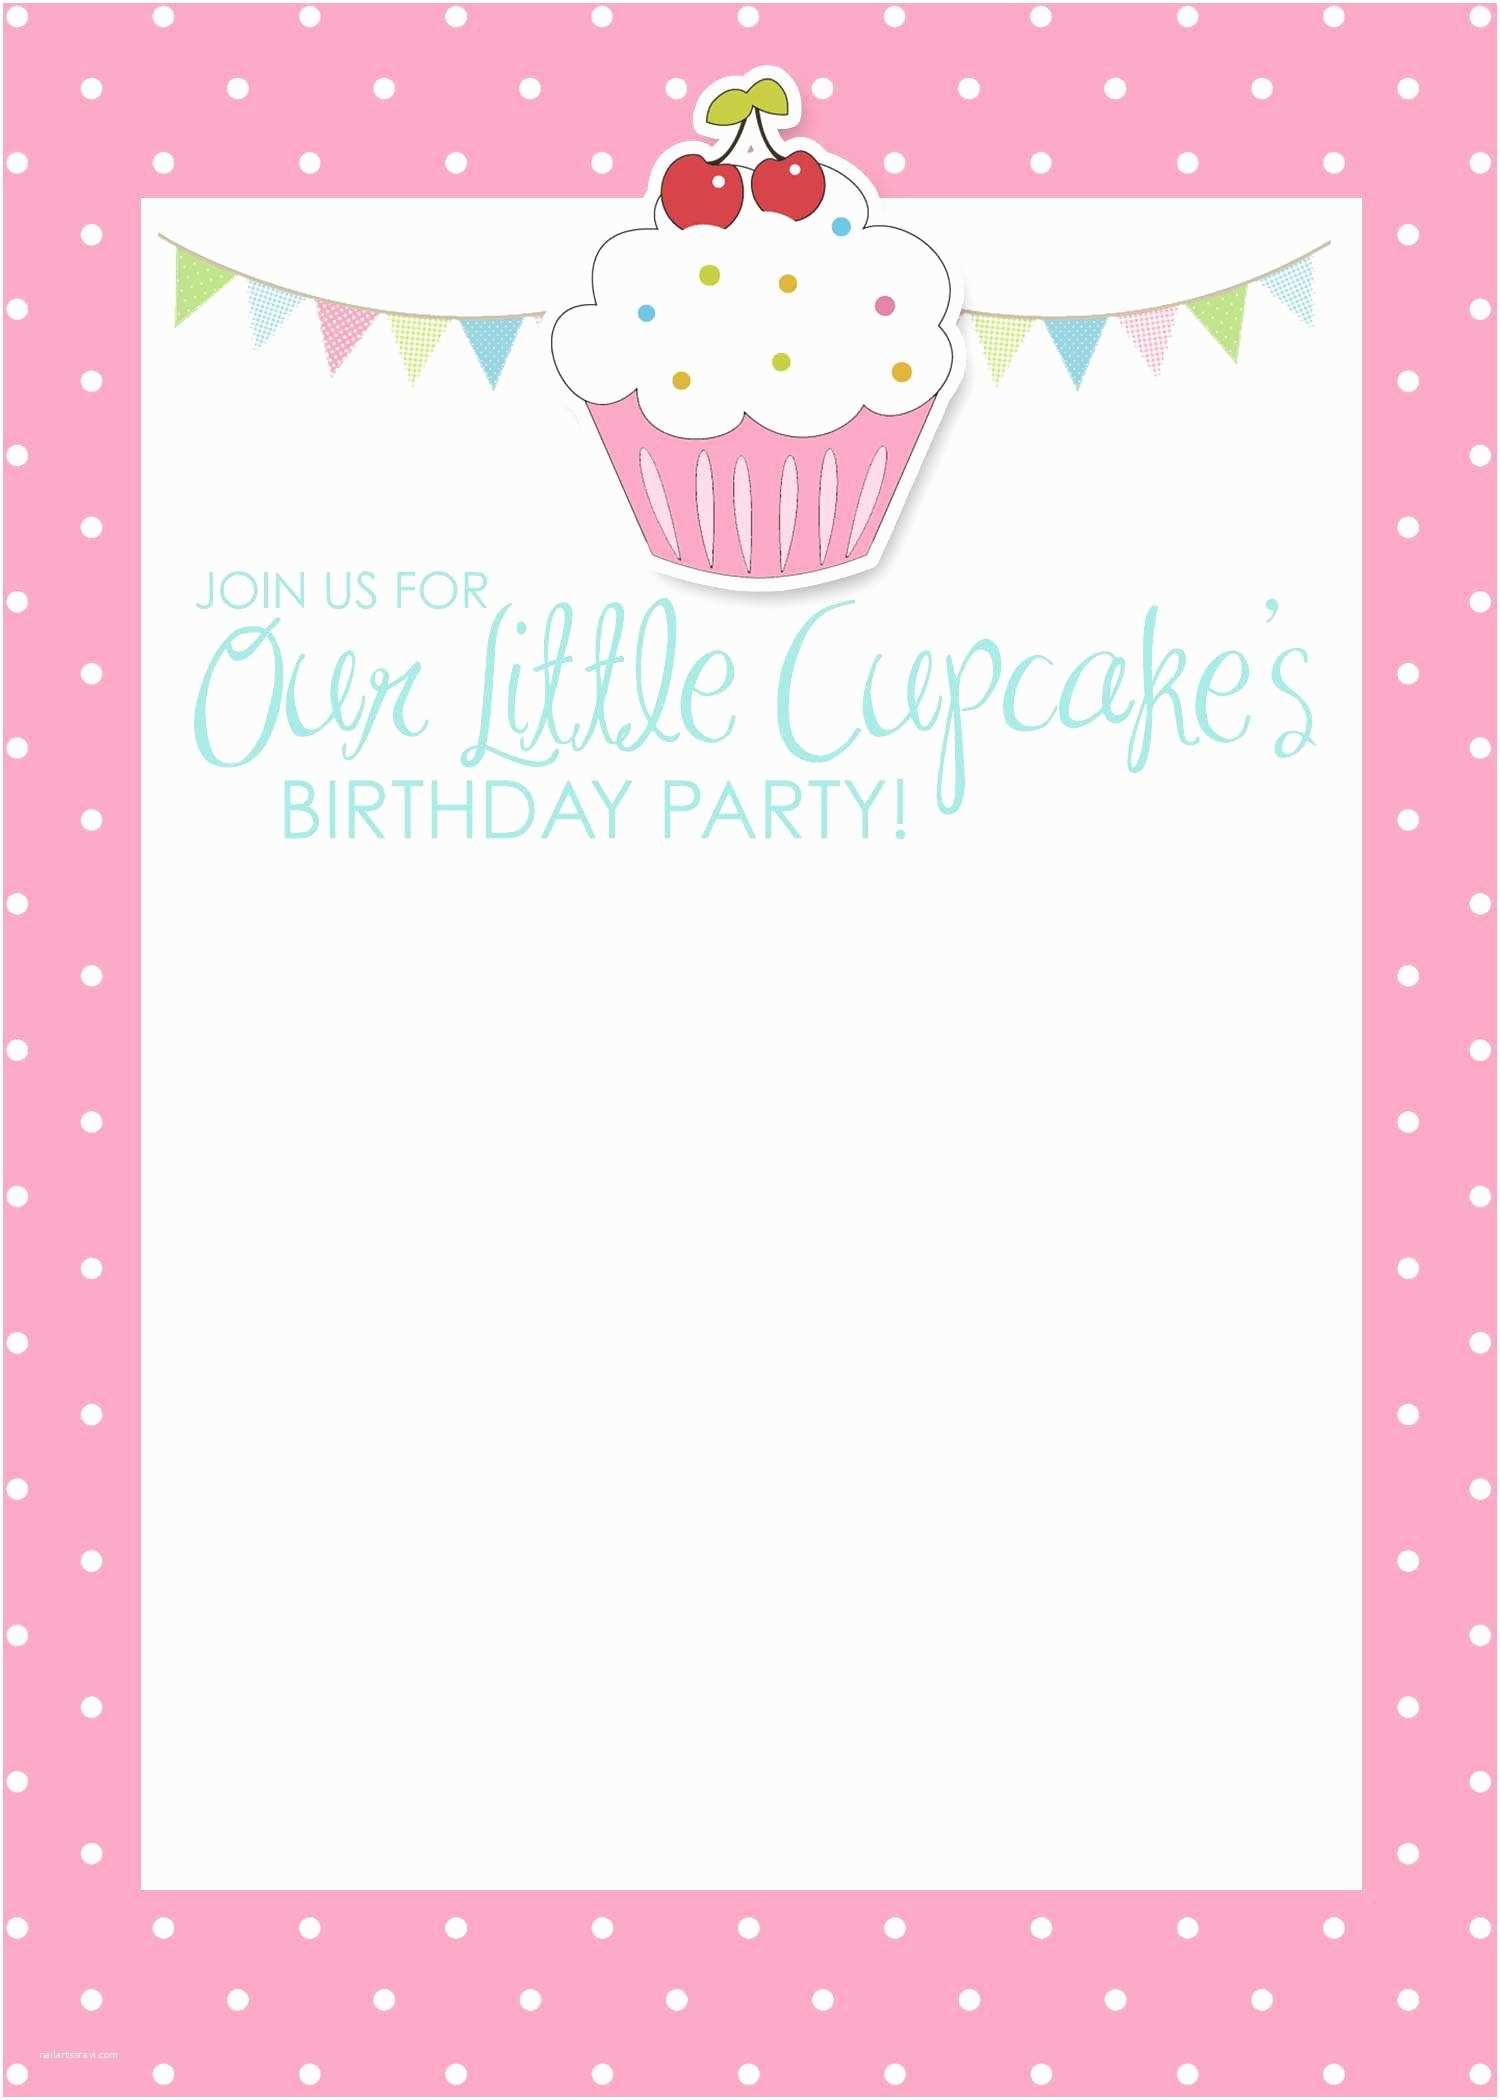 Birthday Card Invitations Birthday Invitation Card Template Birthday Invitation